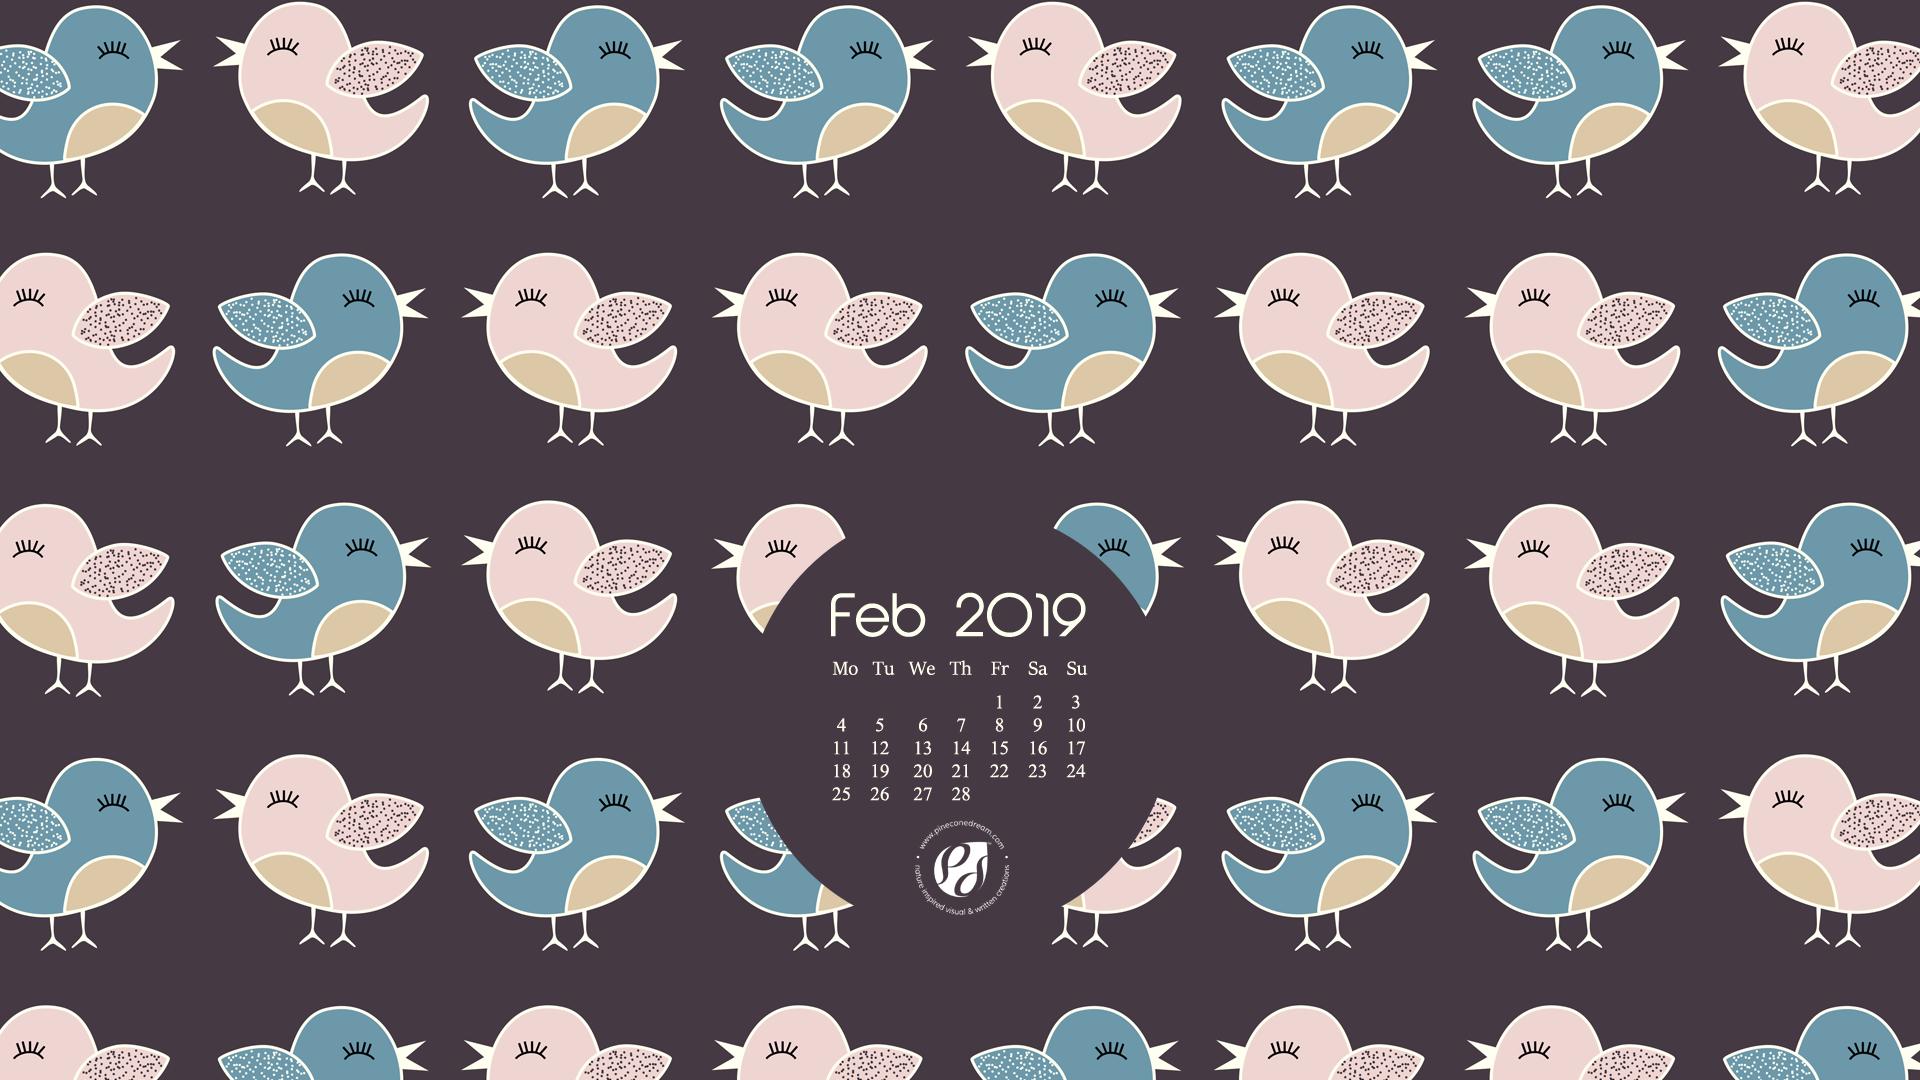 February Cute Desktop Calendar 2019 Feb 2019 free calendar wallpapers & planner   illustrated cute